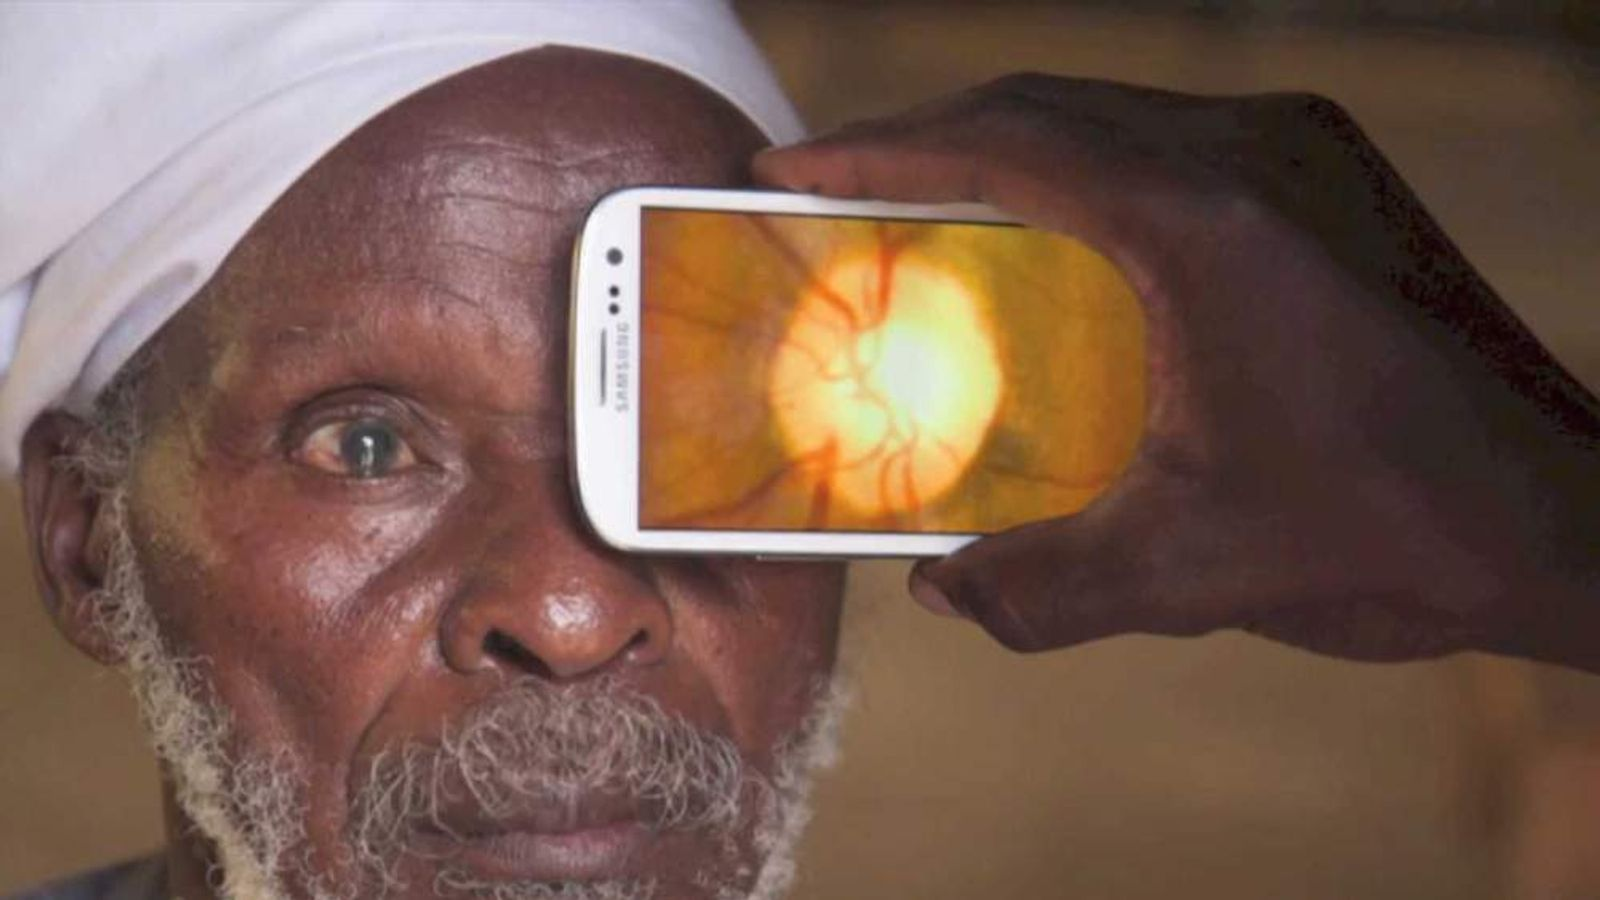 Peek eyephone app promo